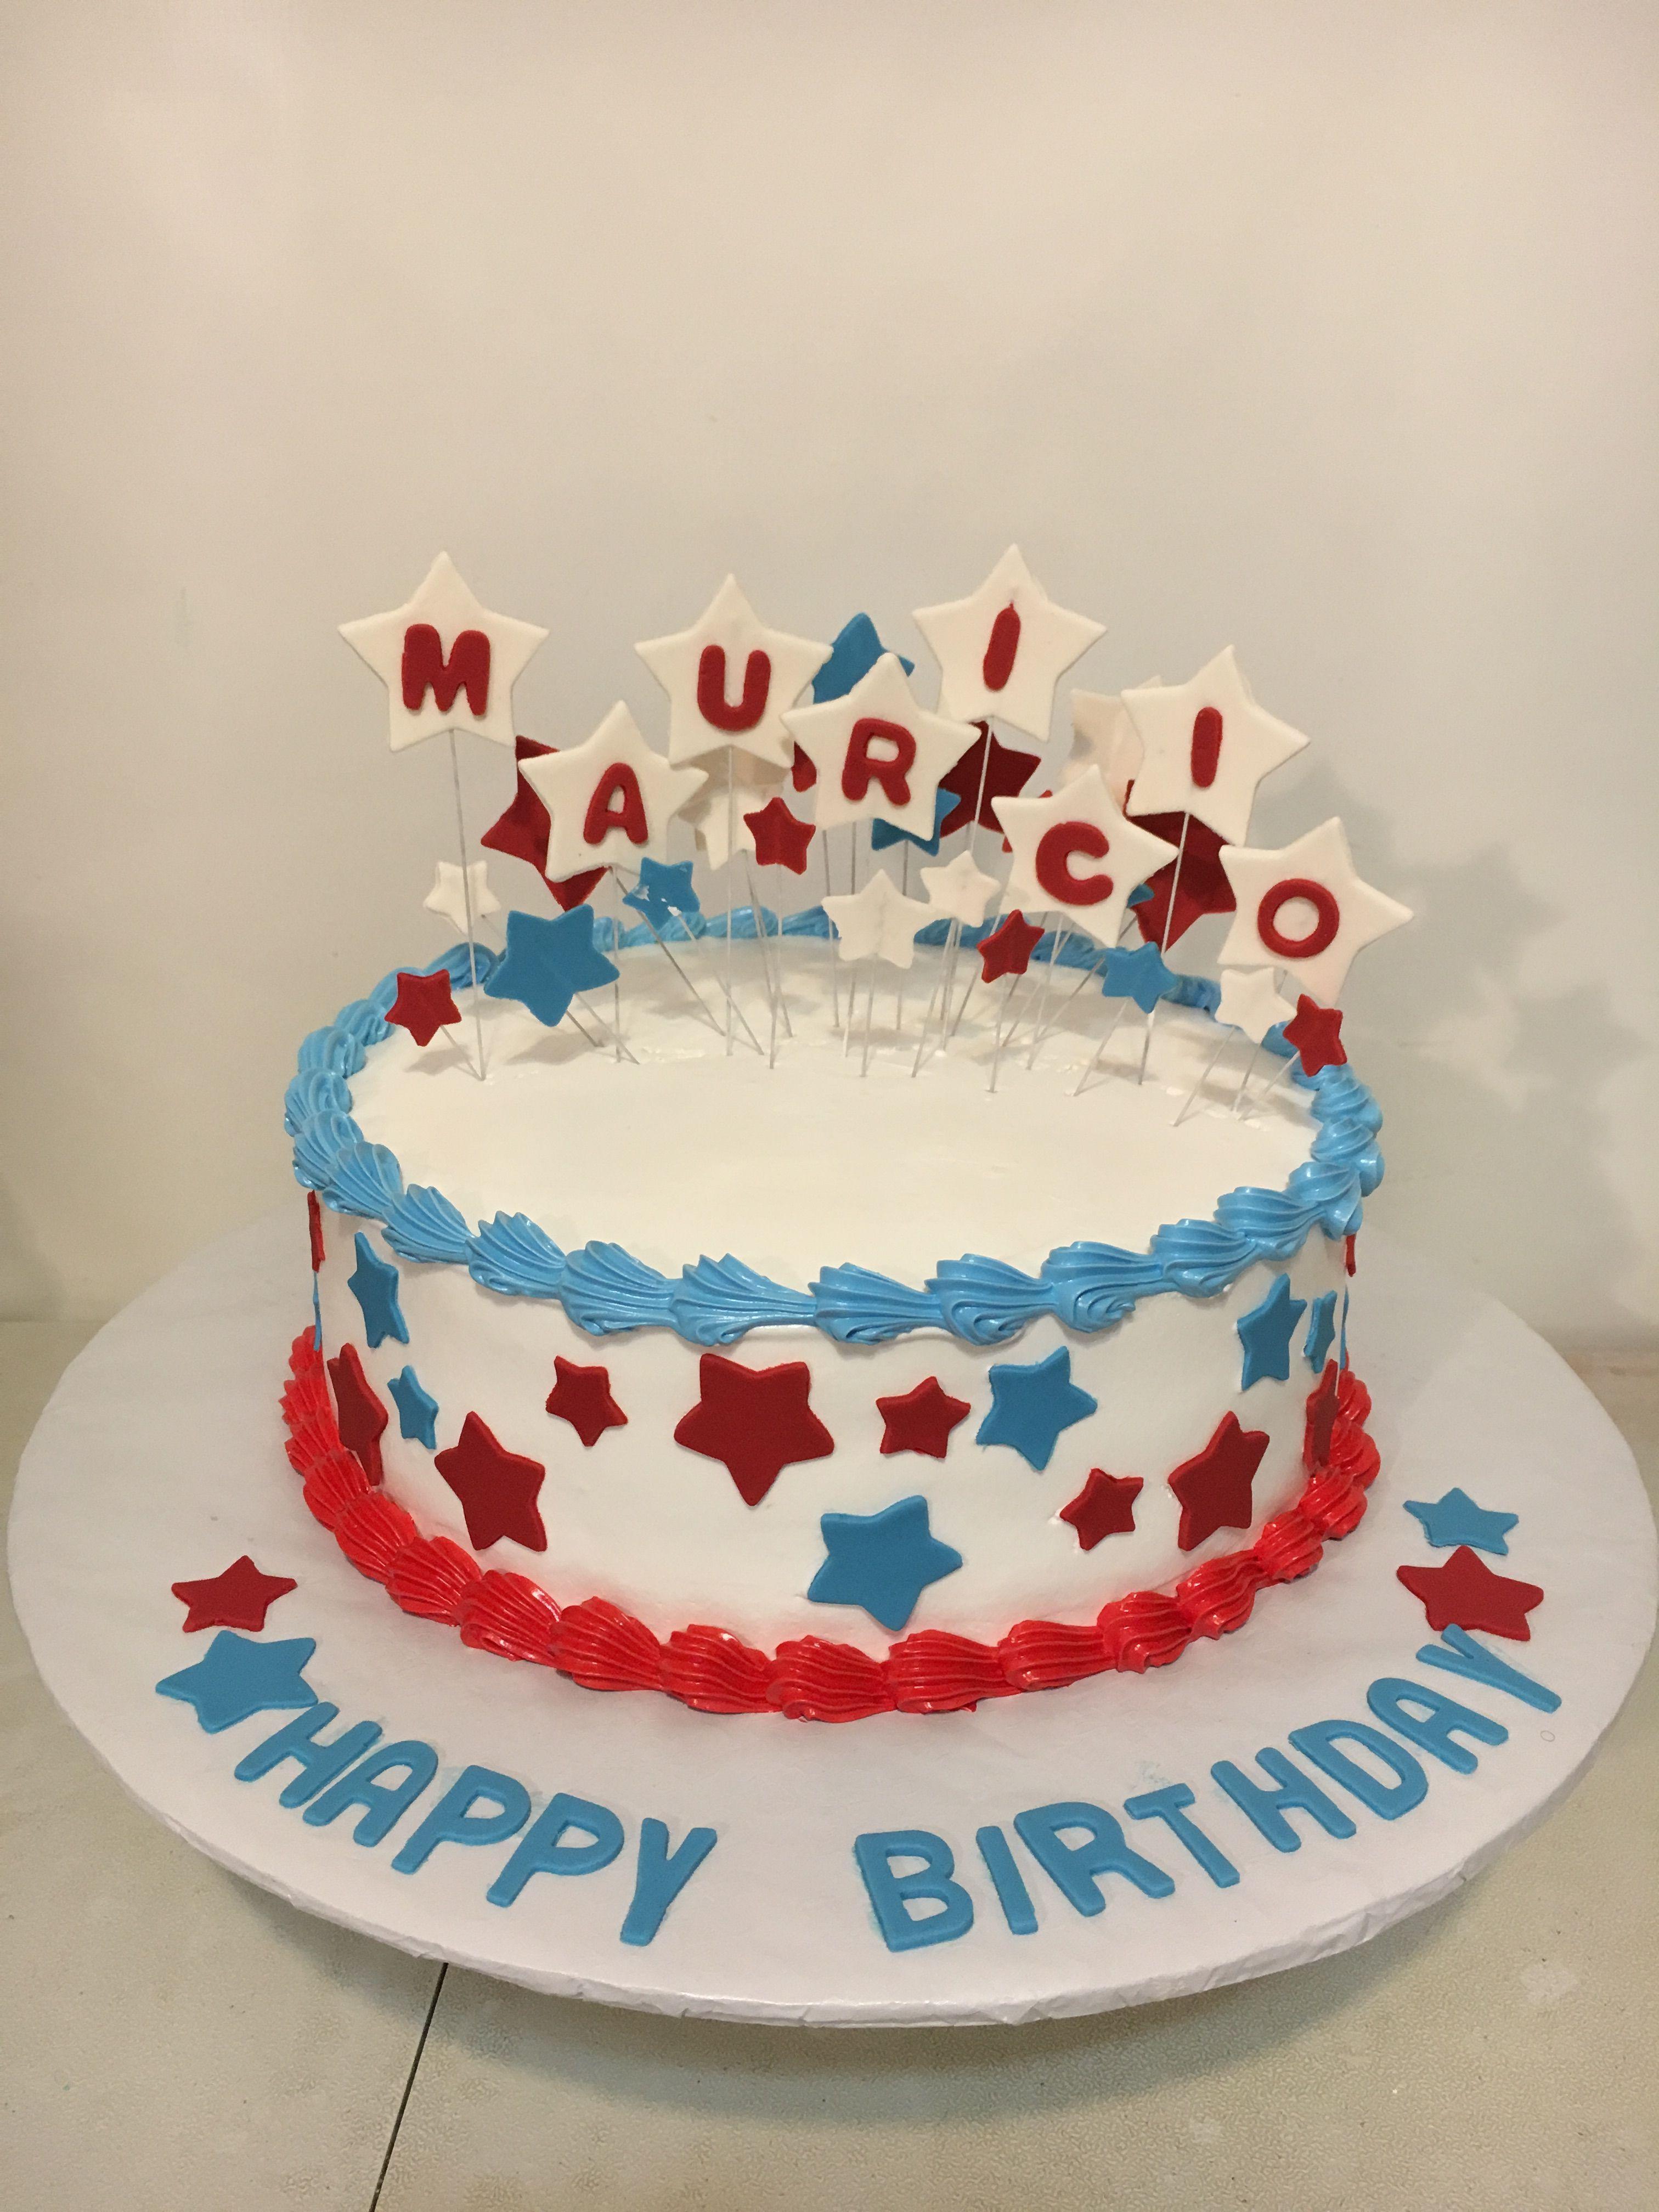 Pin by sugar flower on birthday cake pinterest birthday cakes